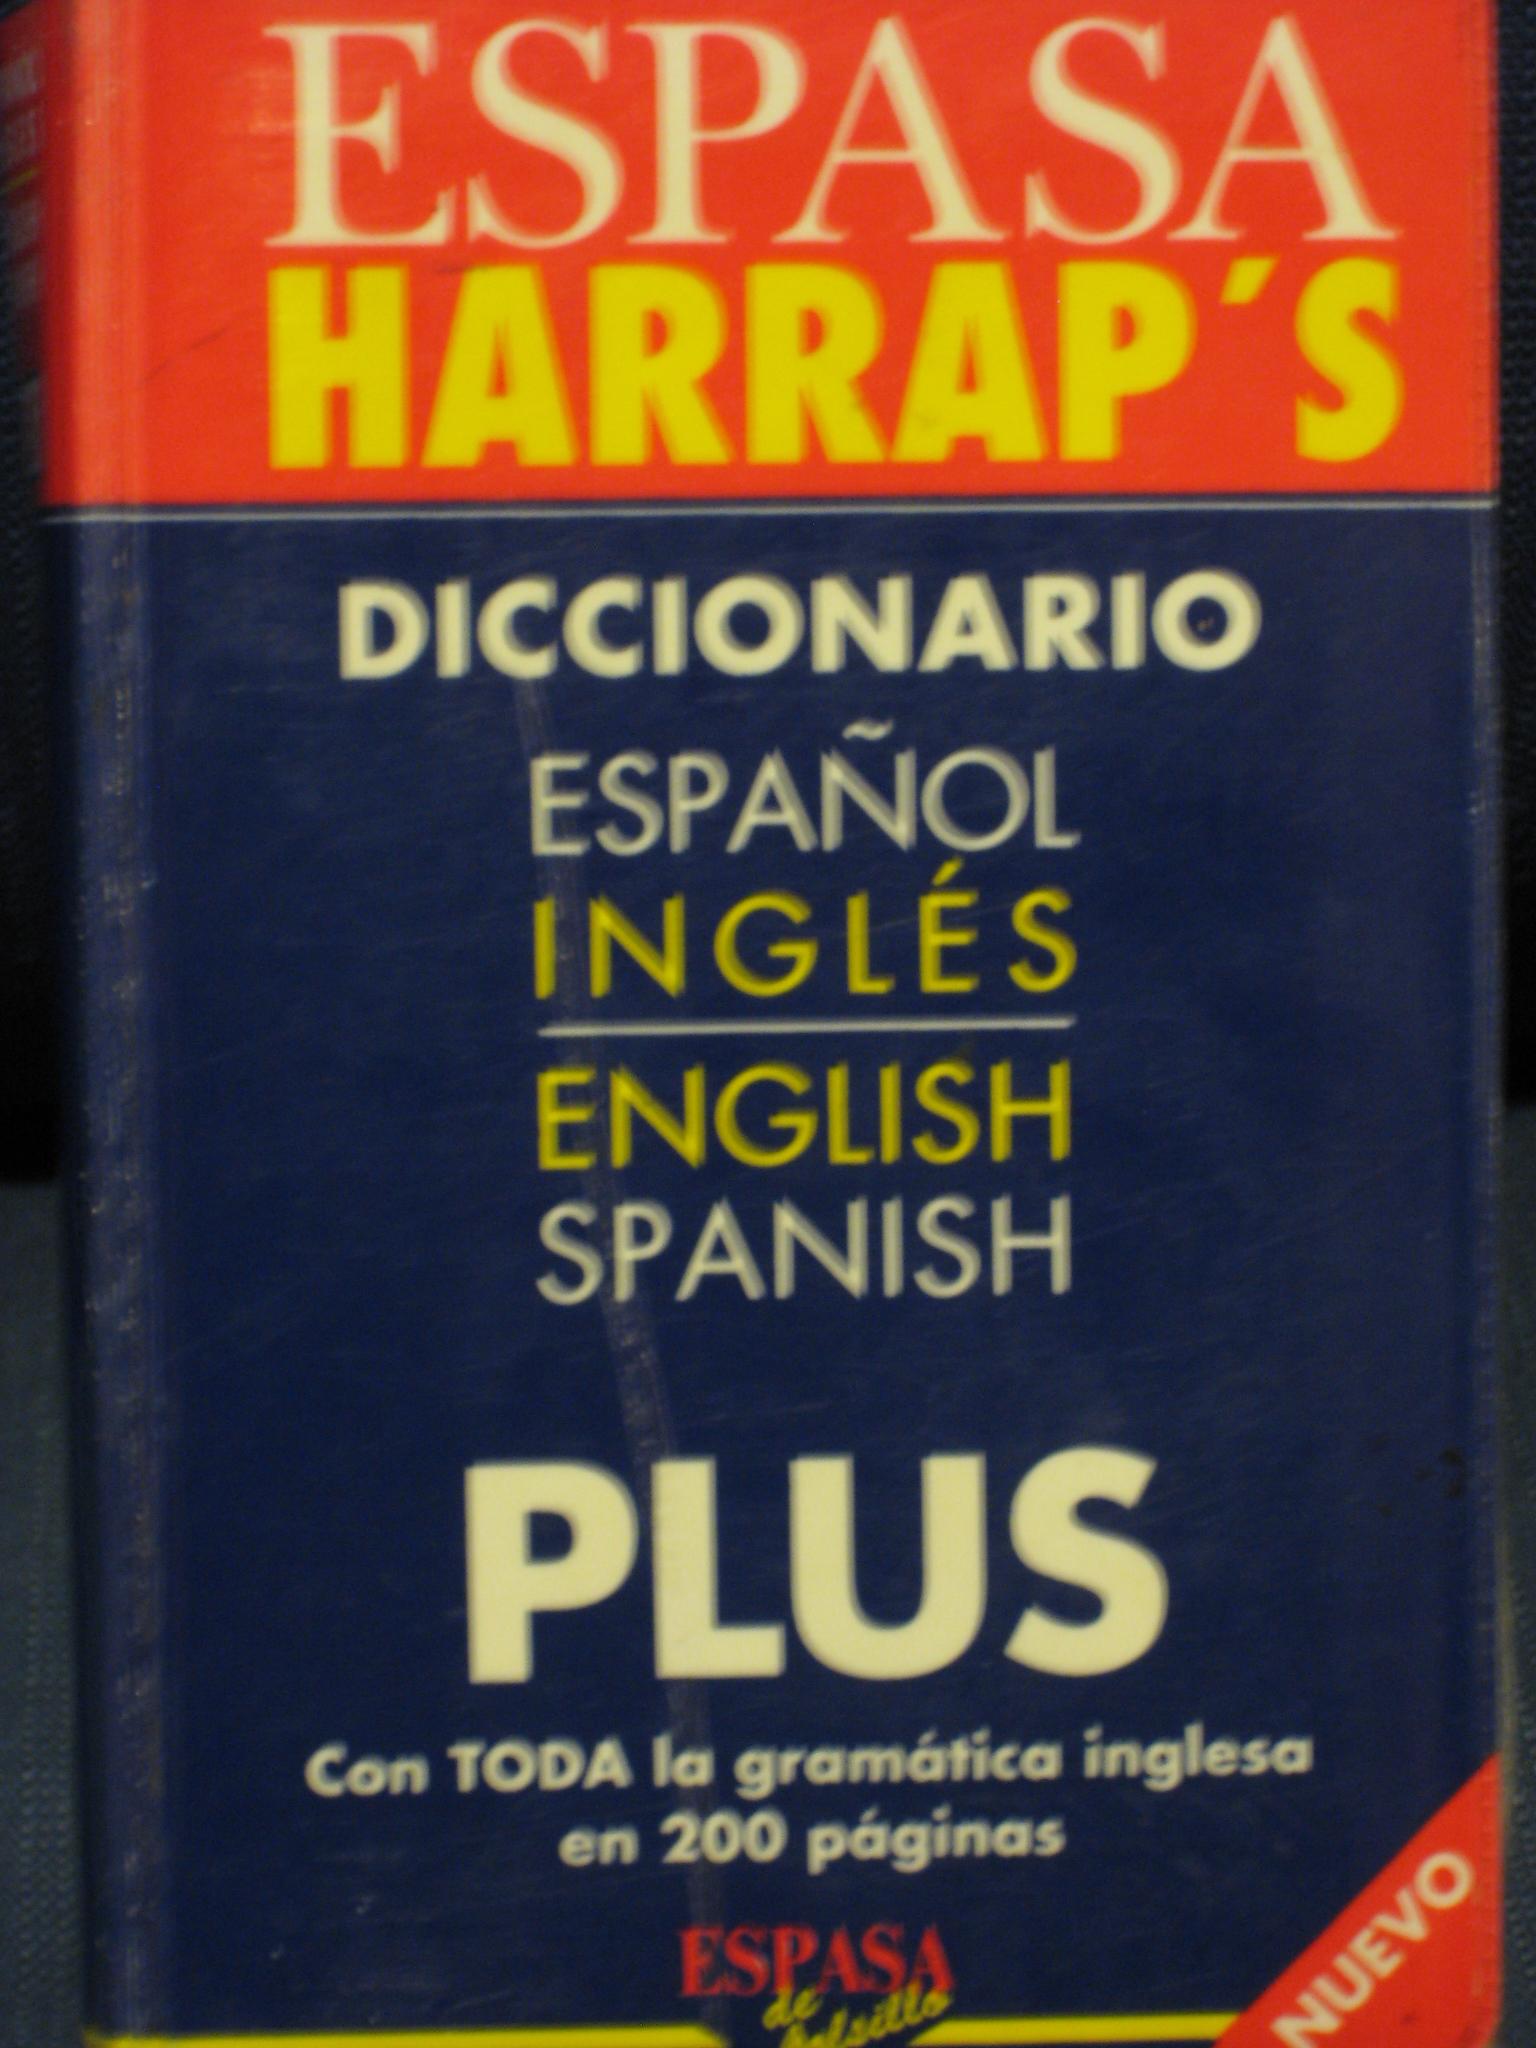 Espasa Harrap's Diccionario Plus español-inglés/english-spanish